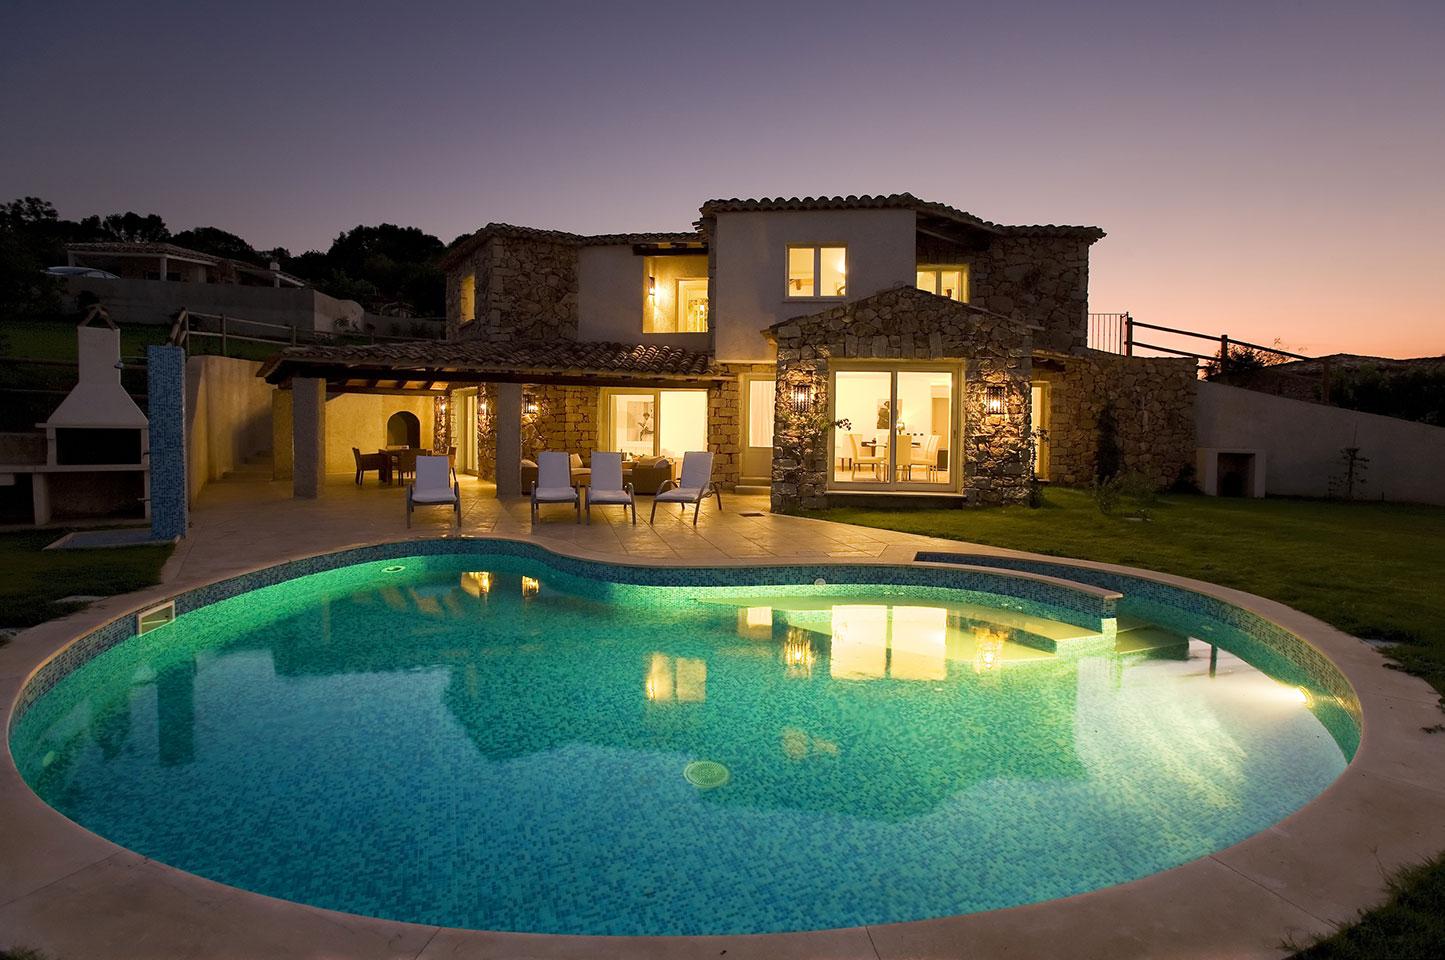 Ville melodia costa rei muravera sardinia italy for Home piscine